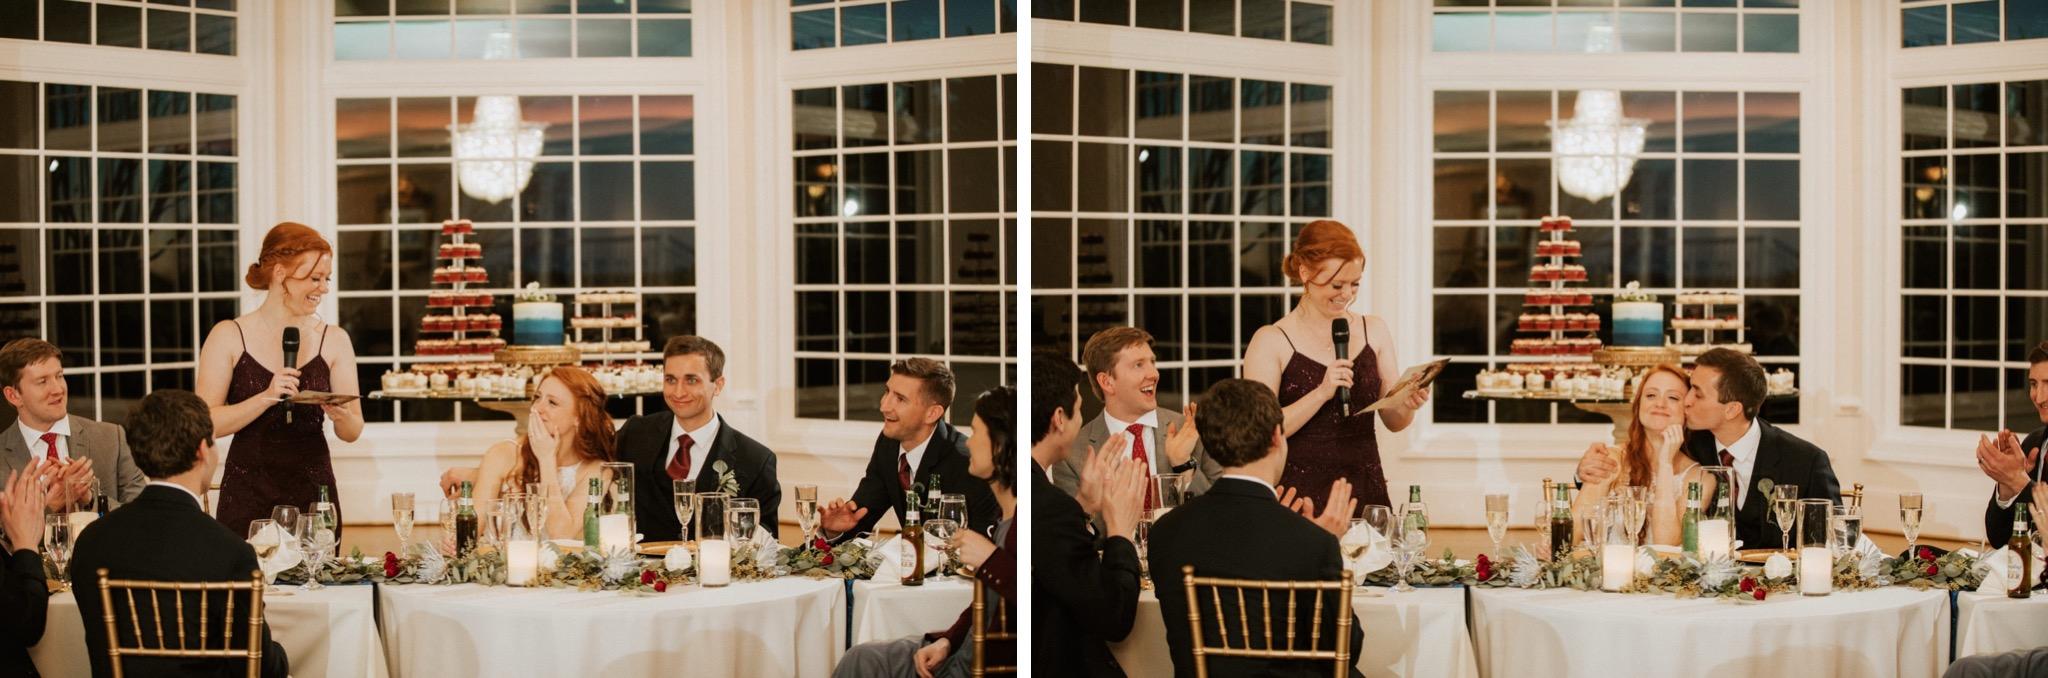 81_West Manor Estate Weddings - Pat Cori Photography-176_West Manor Estate Weddings - Pat Cori Photography-177_VirginiaWeddingPhotographer_toasts_WestManorEstate_Weddingvenue_Wedding.jpg